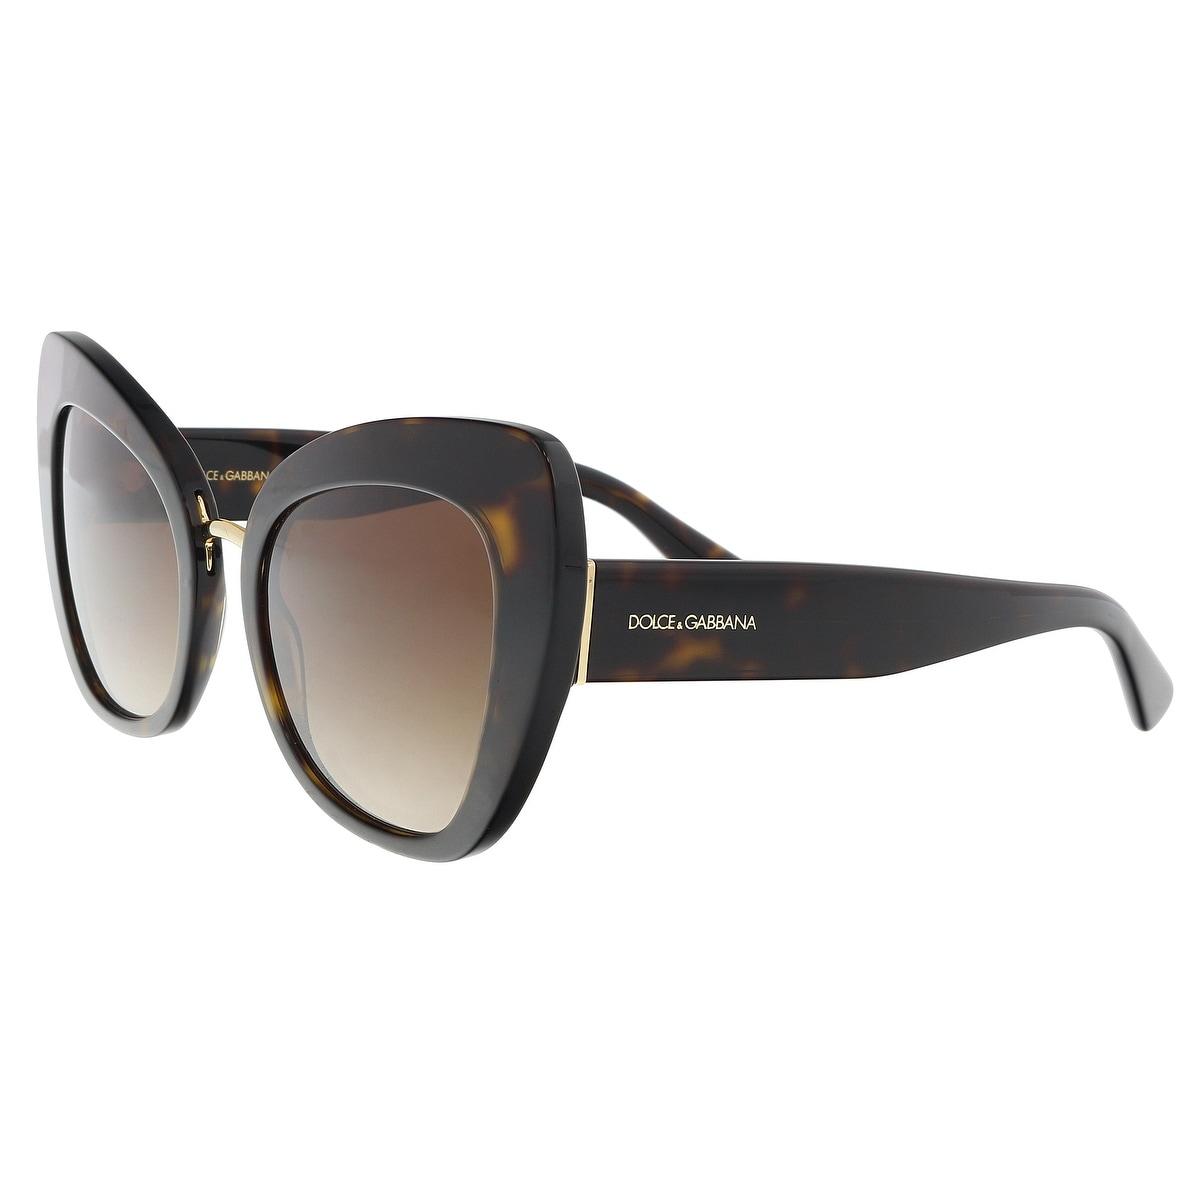 ca4e48a6f82 Dolce   Gabbana Women s Sunglasses